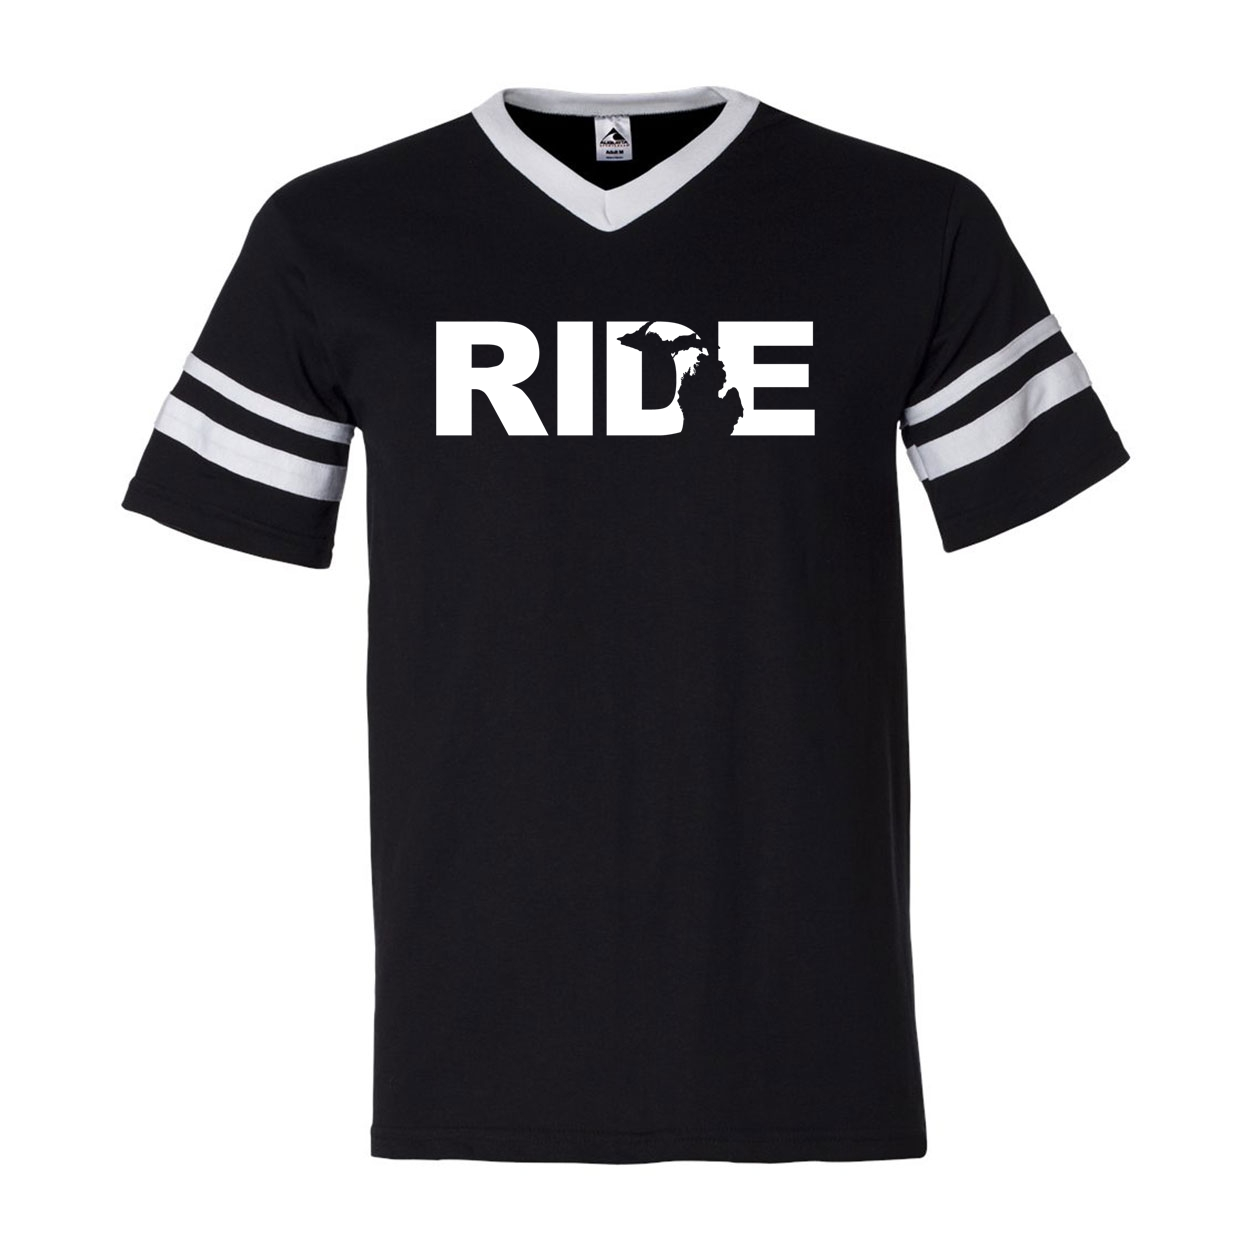 Ride Michigan Classic Premium Striped Jersey T-Shirt Black/White (White Logo)